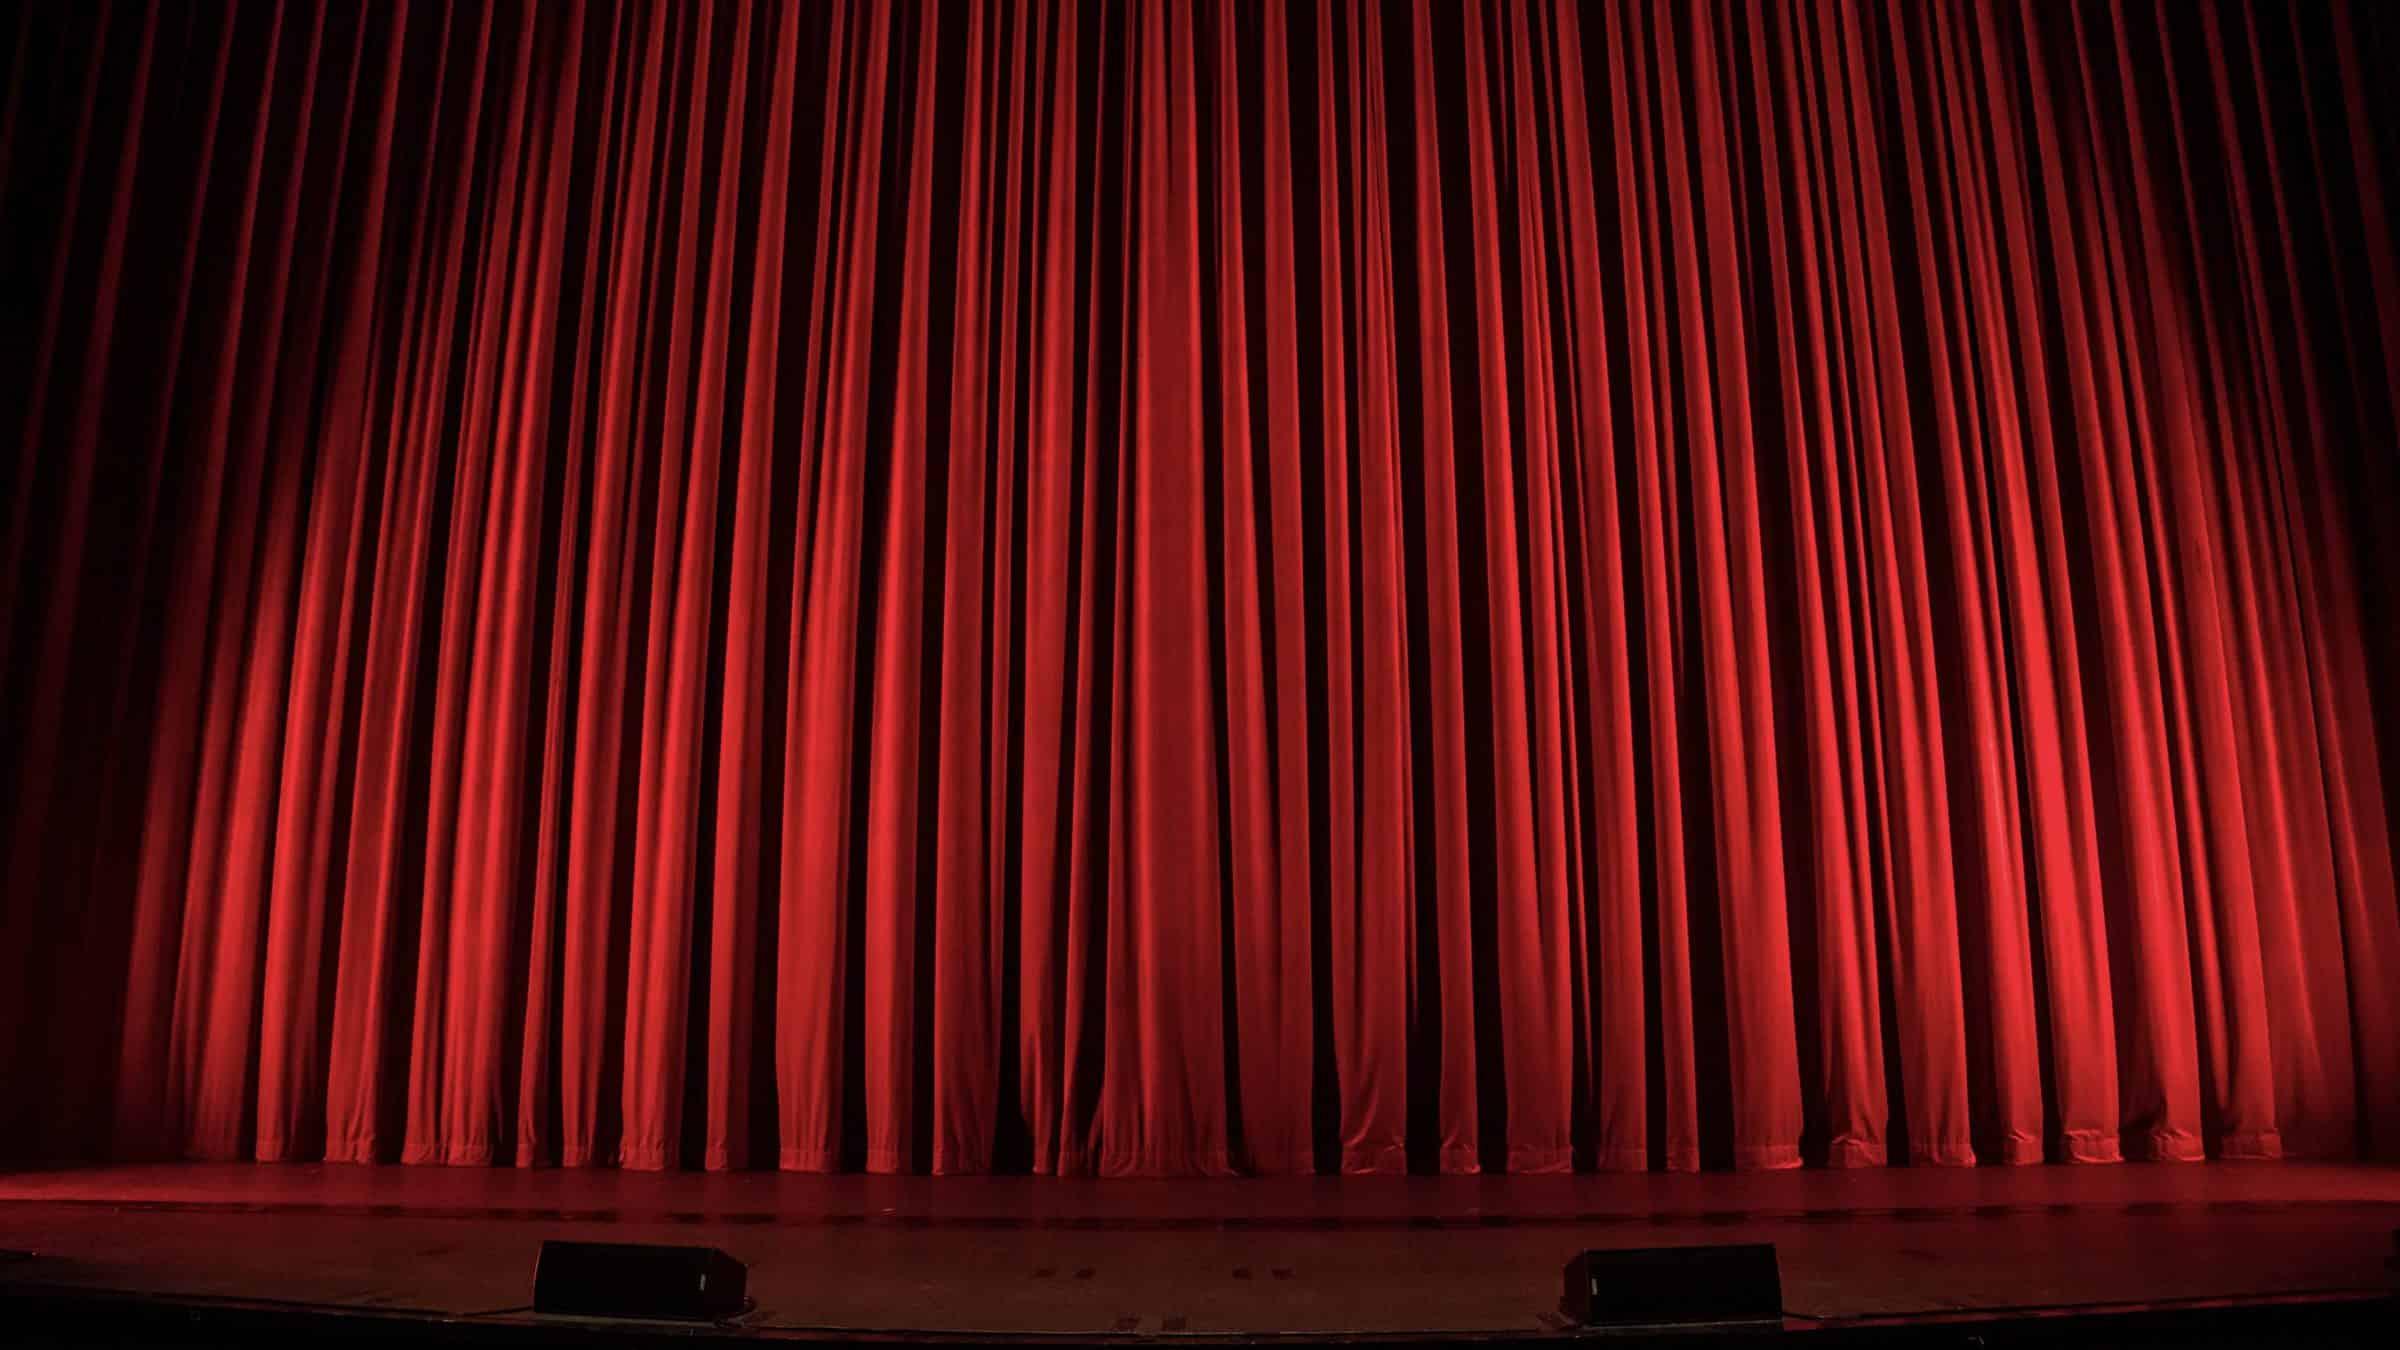 Theater - online event - virtual event - optreden - teambuilding - medewerkers - De Remote Show